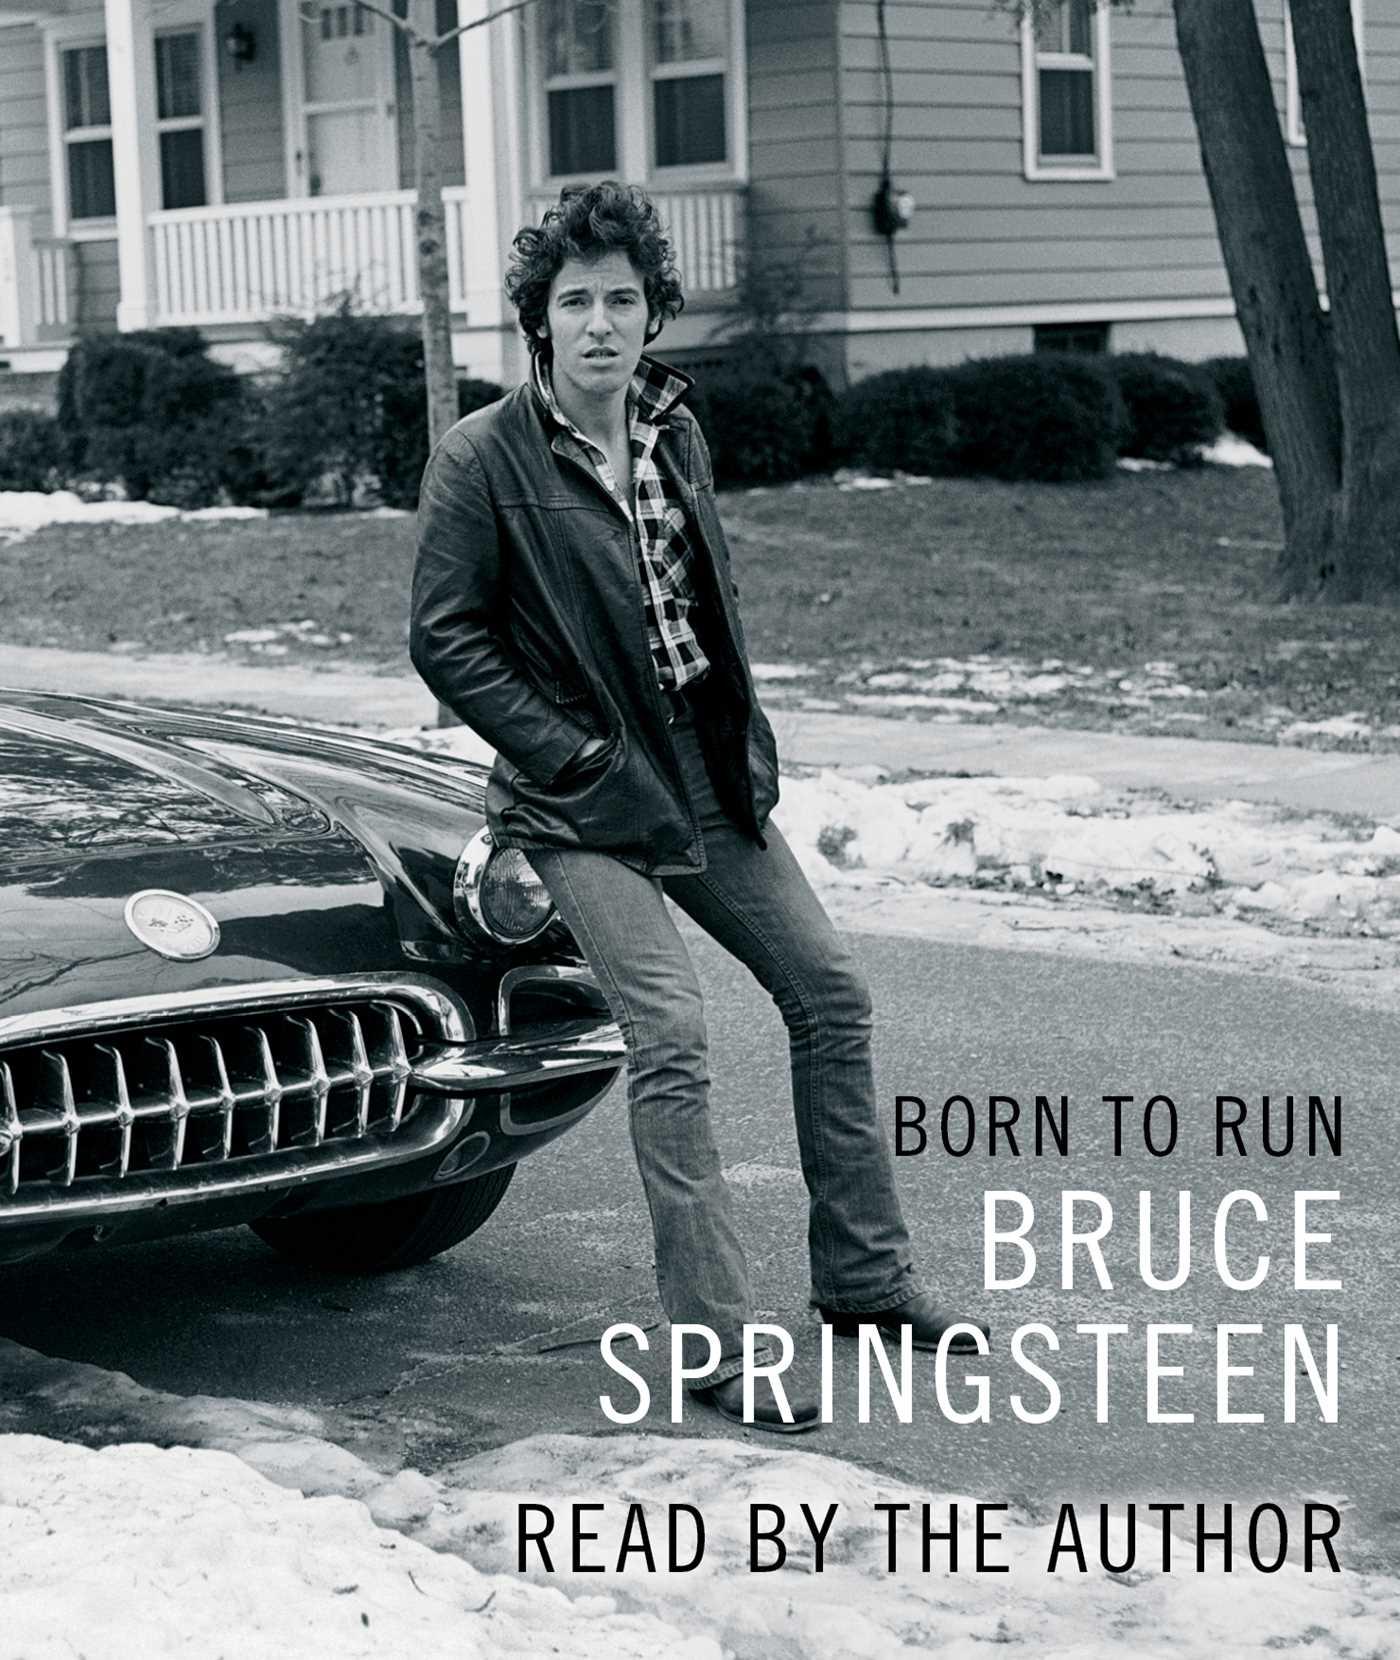 Born to run 9781508224228 hr